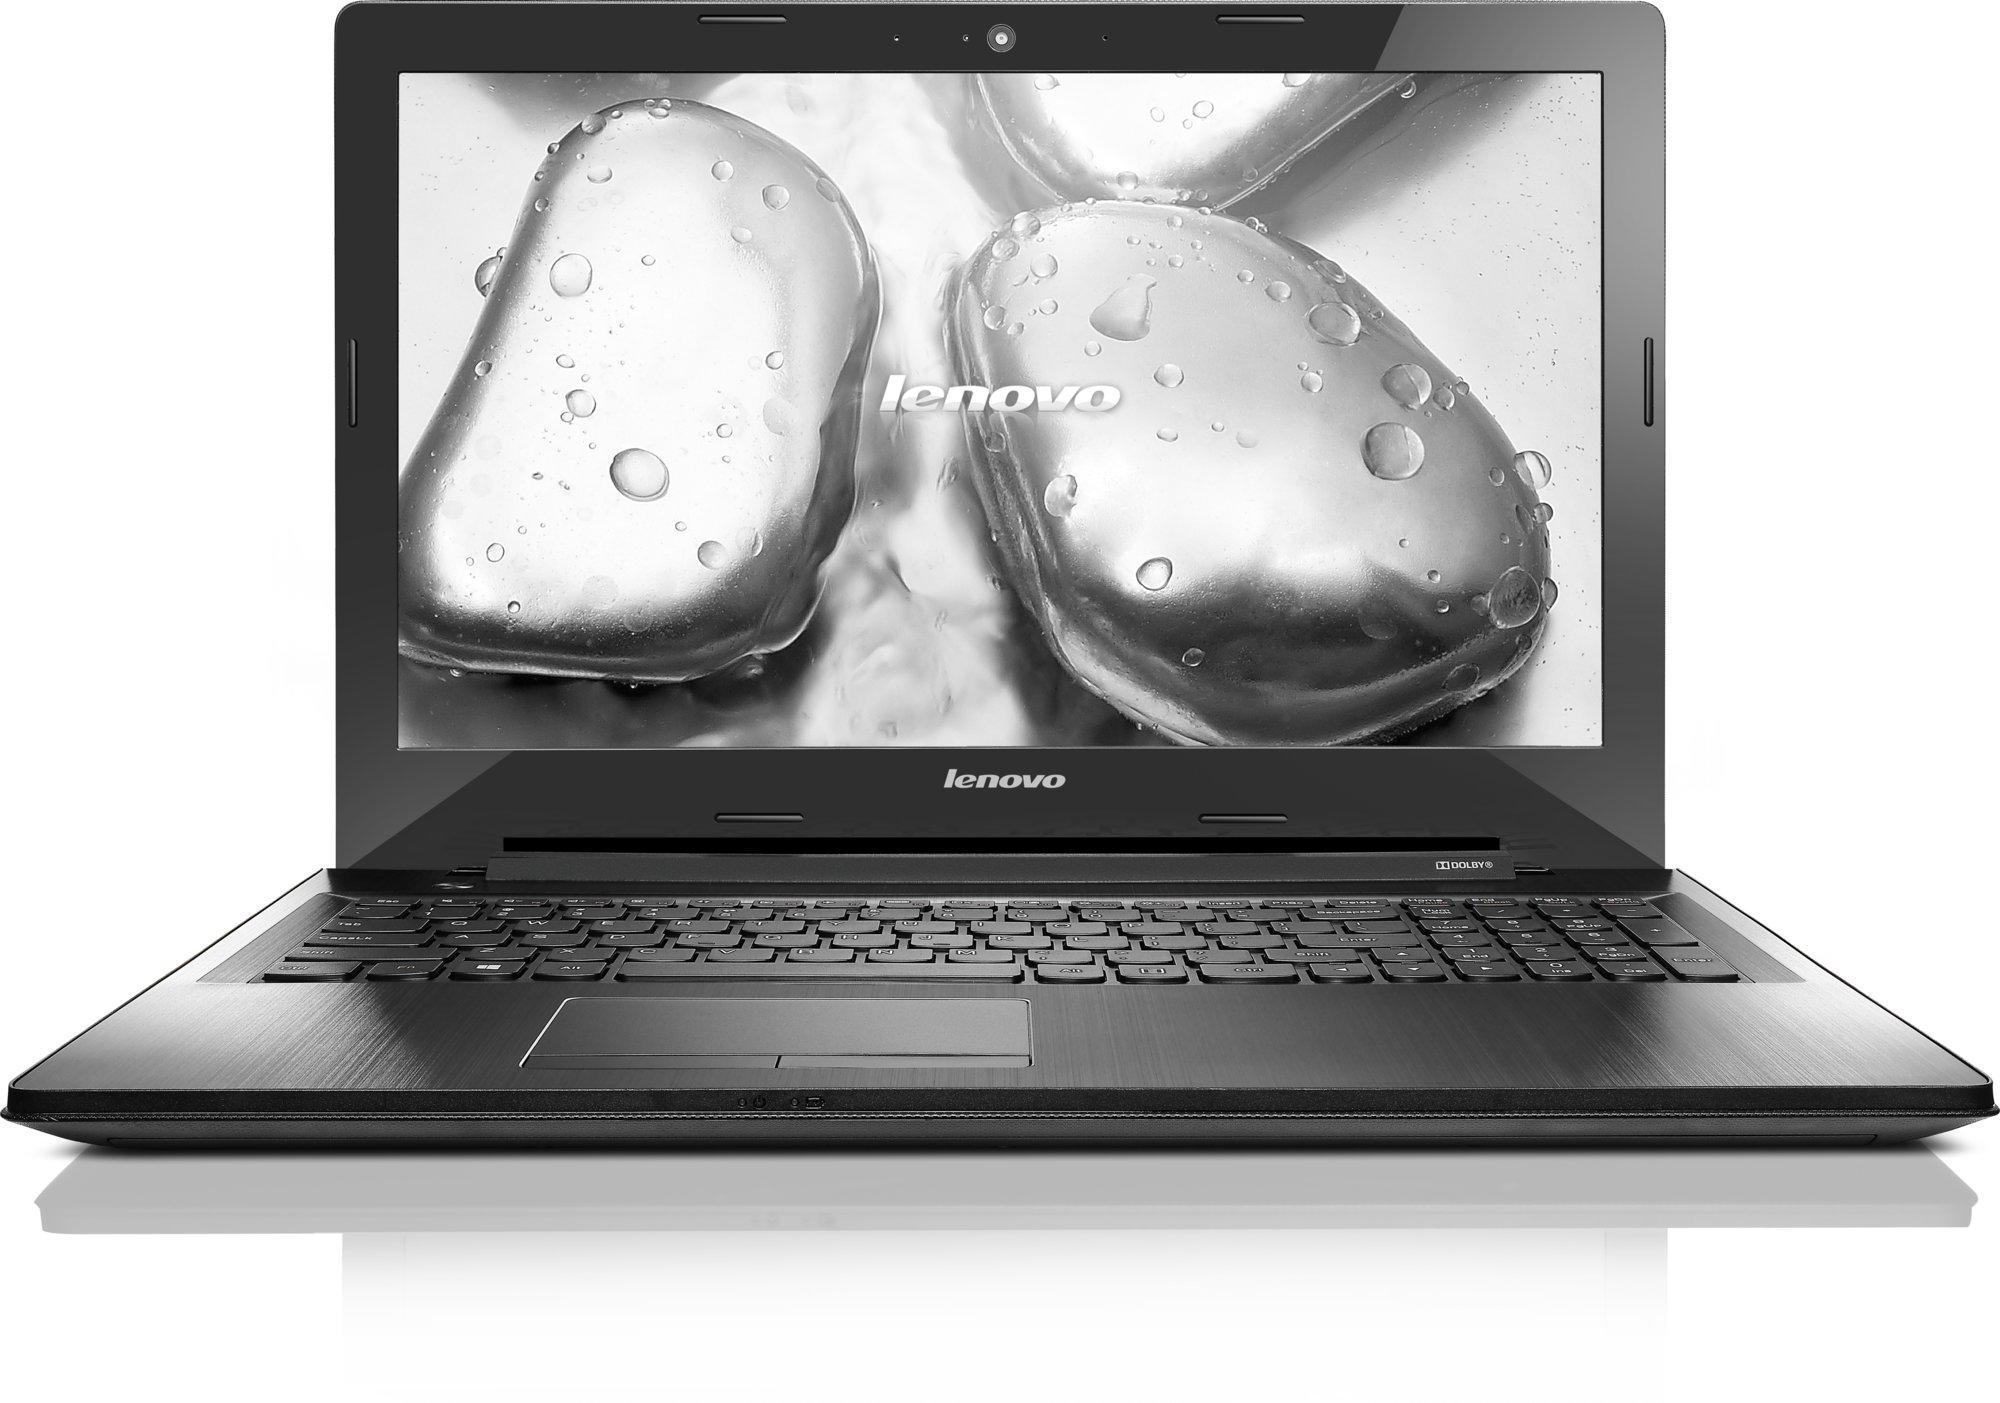 Displej notebooku Lenovo IdeaPad Z50-75